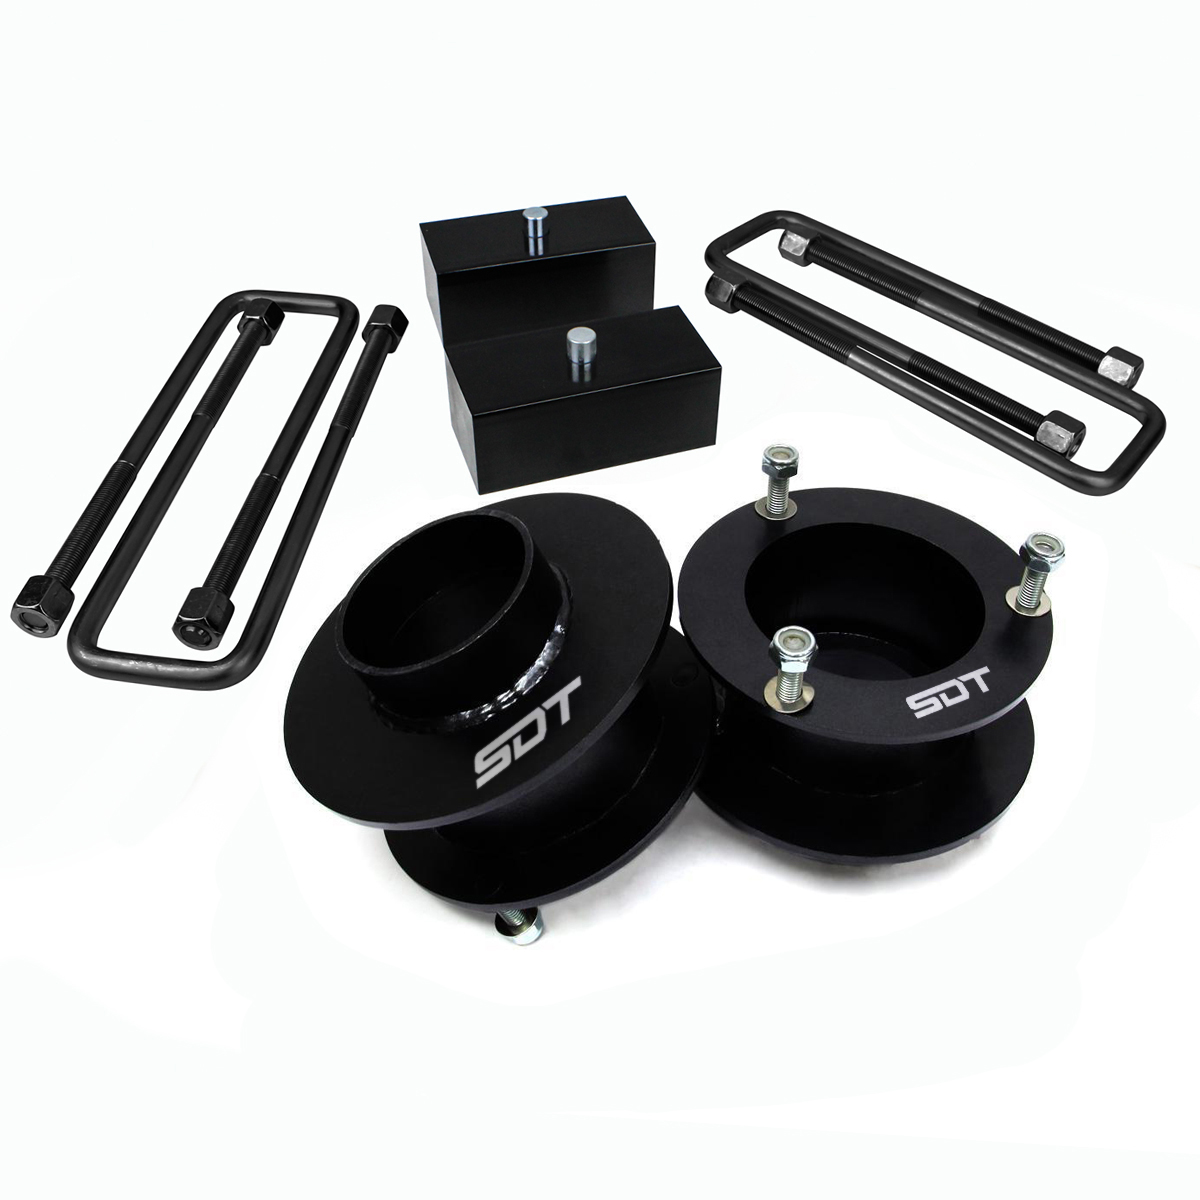 3& 34 Front 2& 34 Rear Leveling Lift Kit 2003 2013 Dodge Ram 2500 3500 4x4 4WD